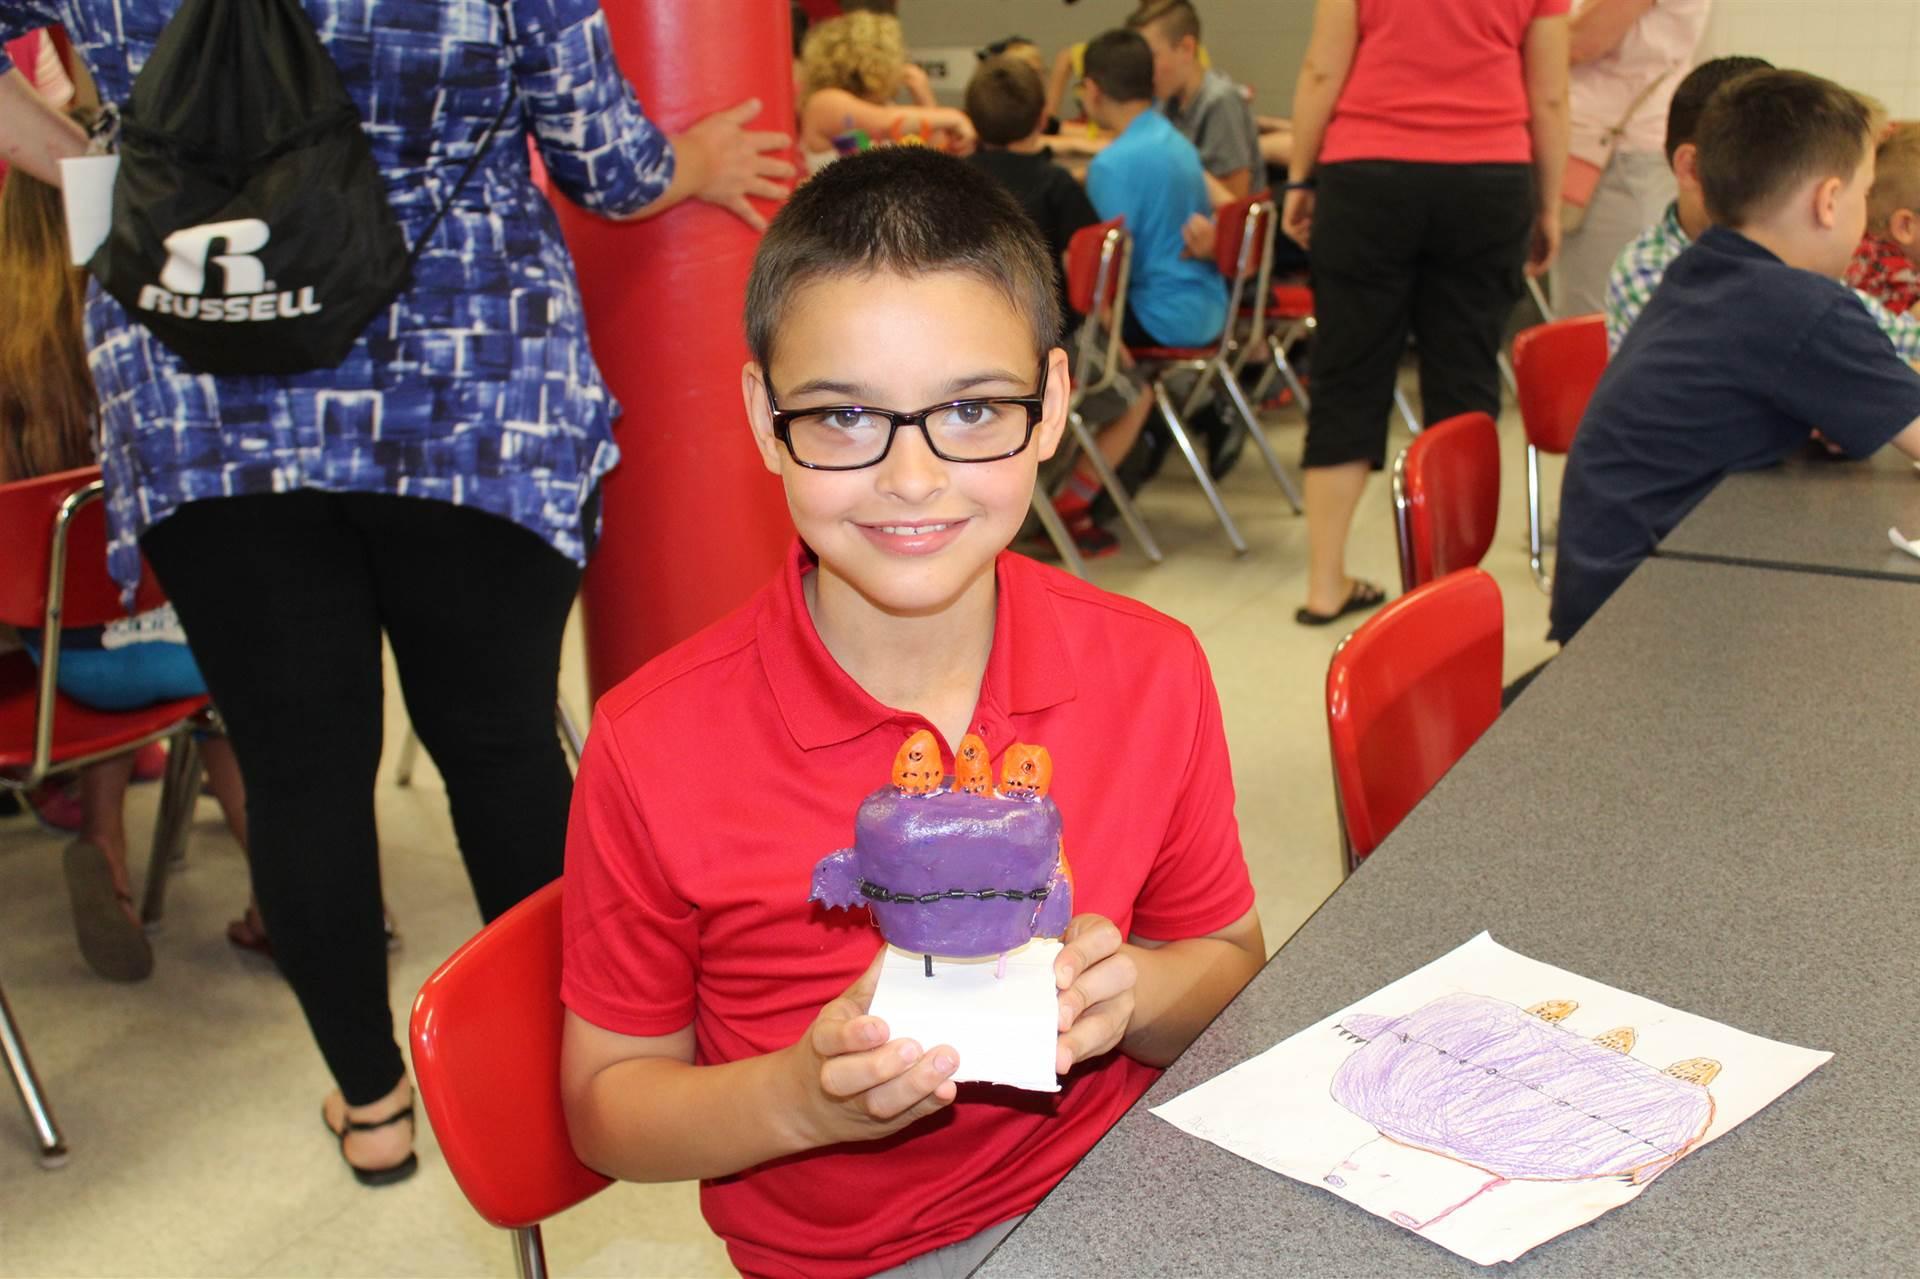 boy sitting smiling holding 3 d monster sculpture in both hands